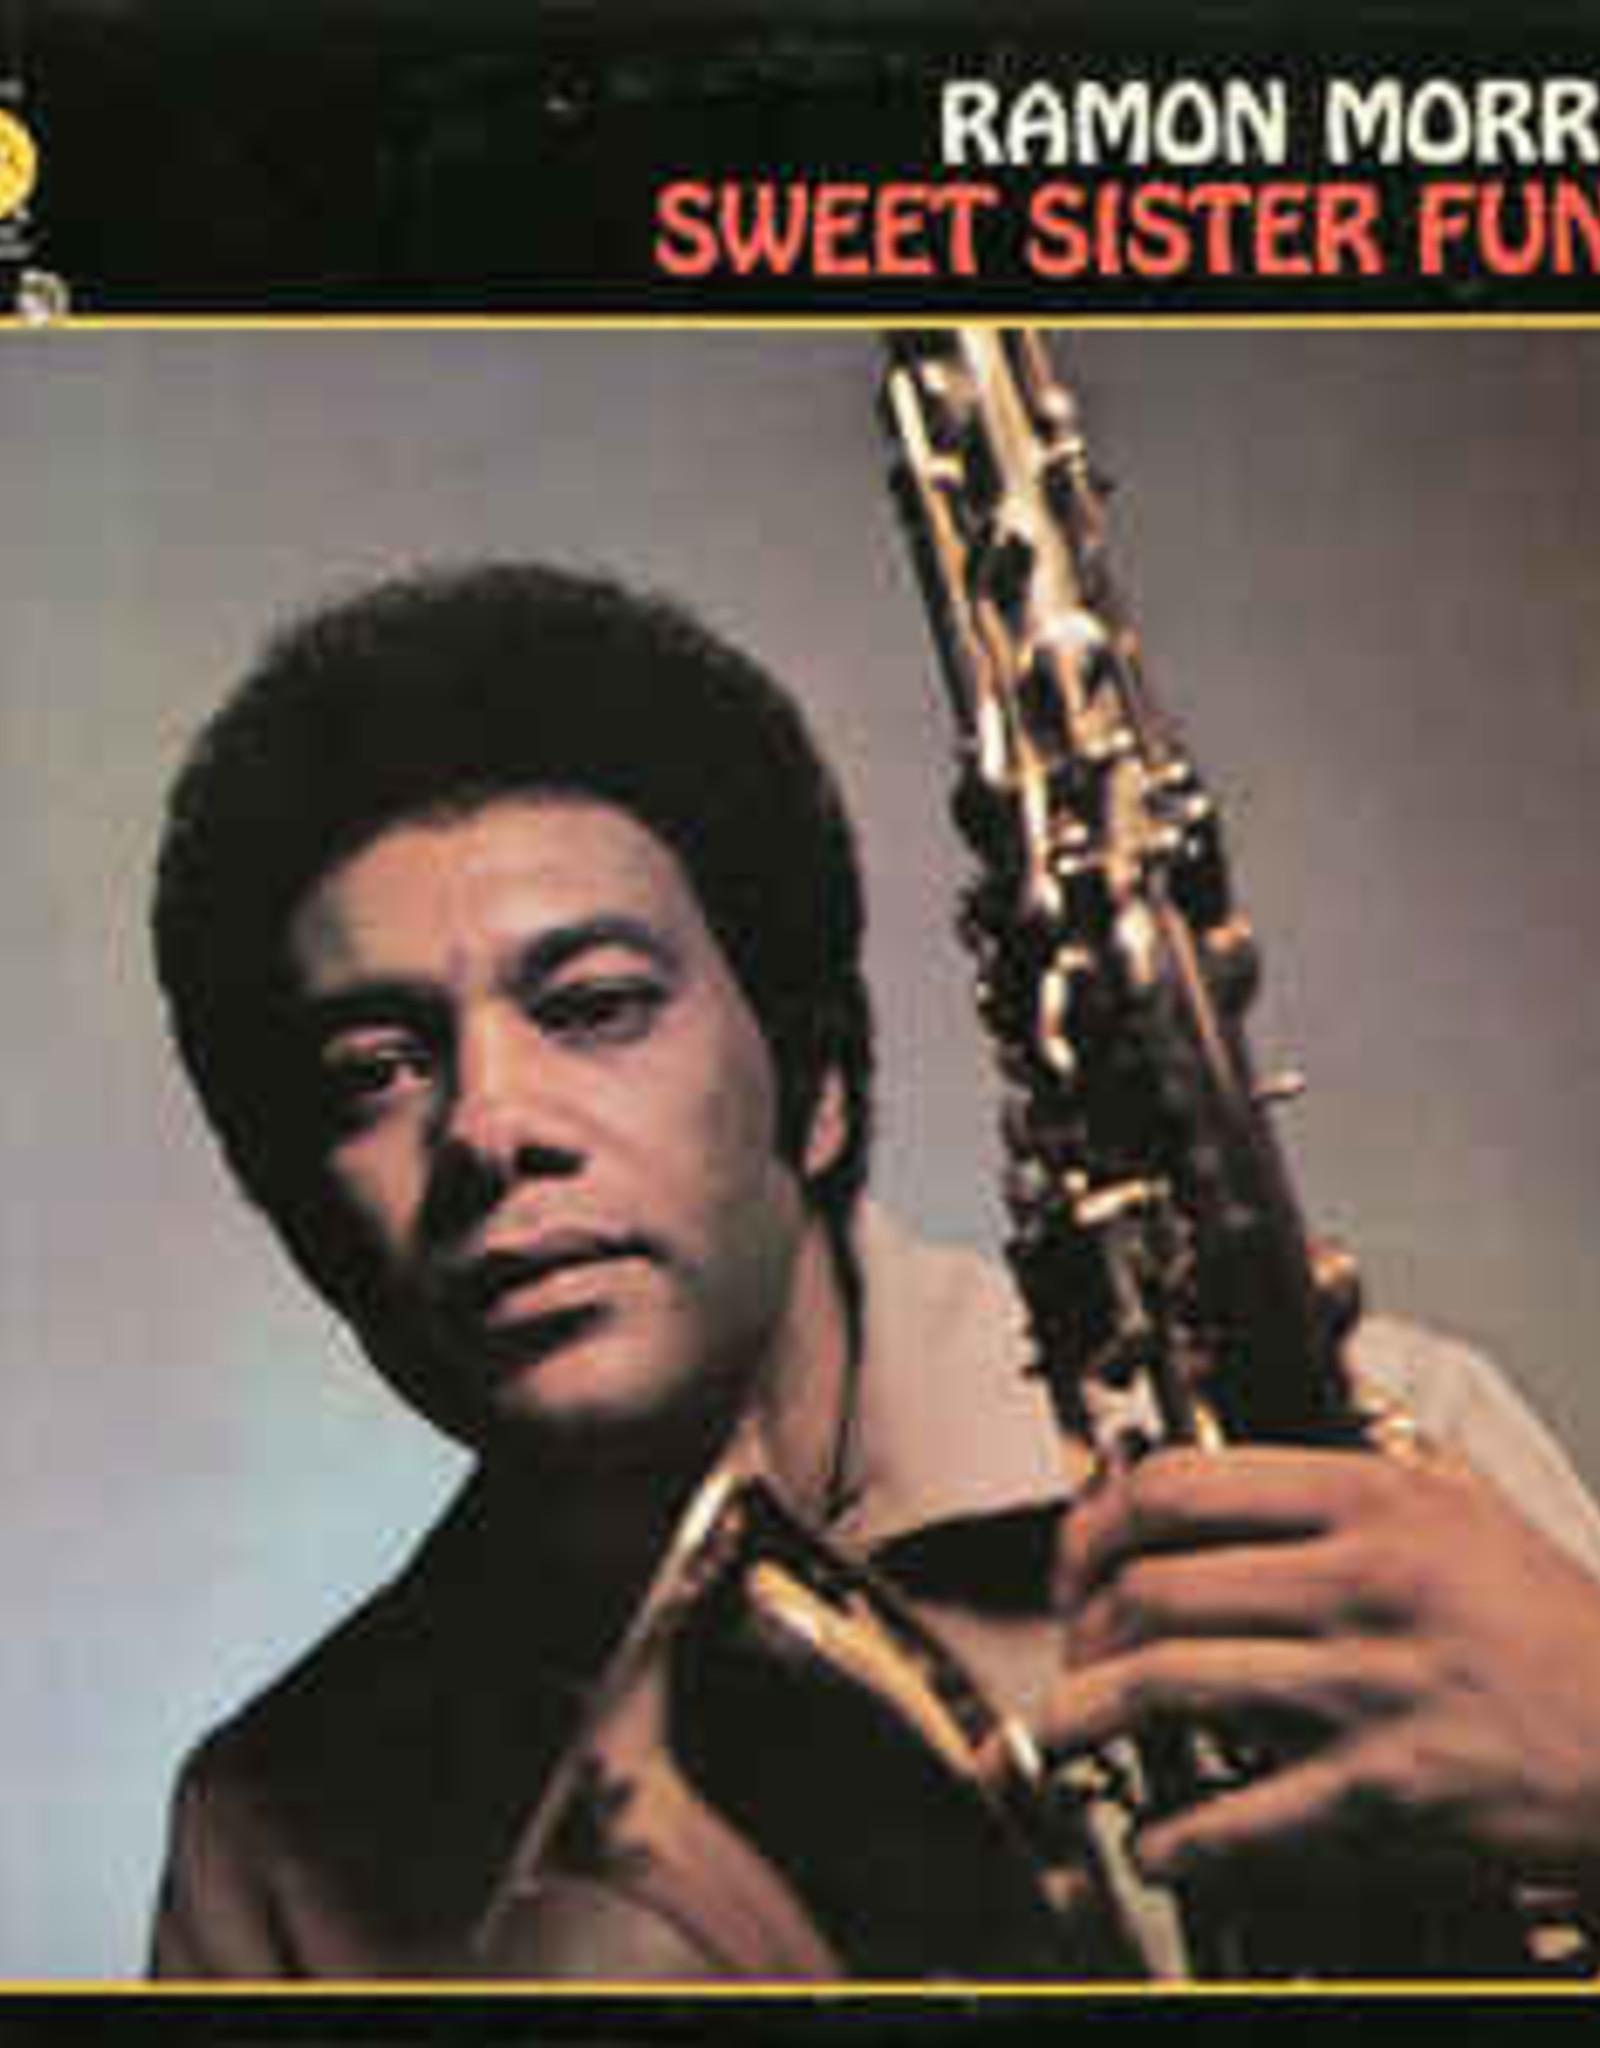 Ramon Morris - Sweet Sister Funk(Lp)